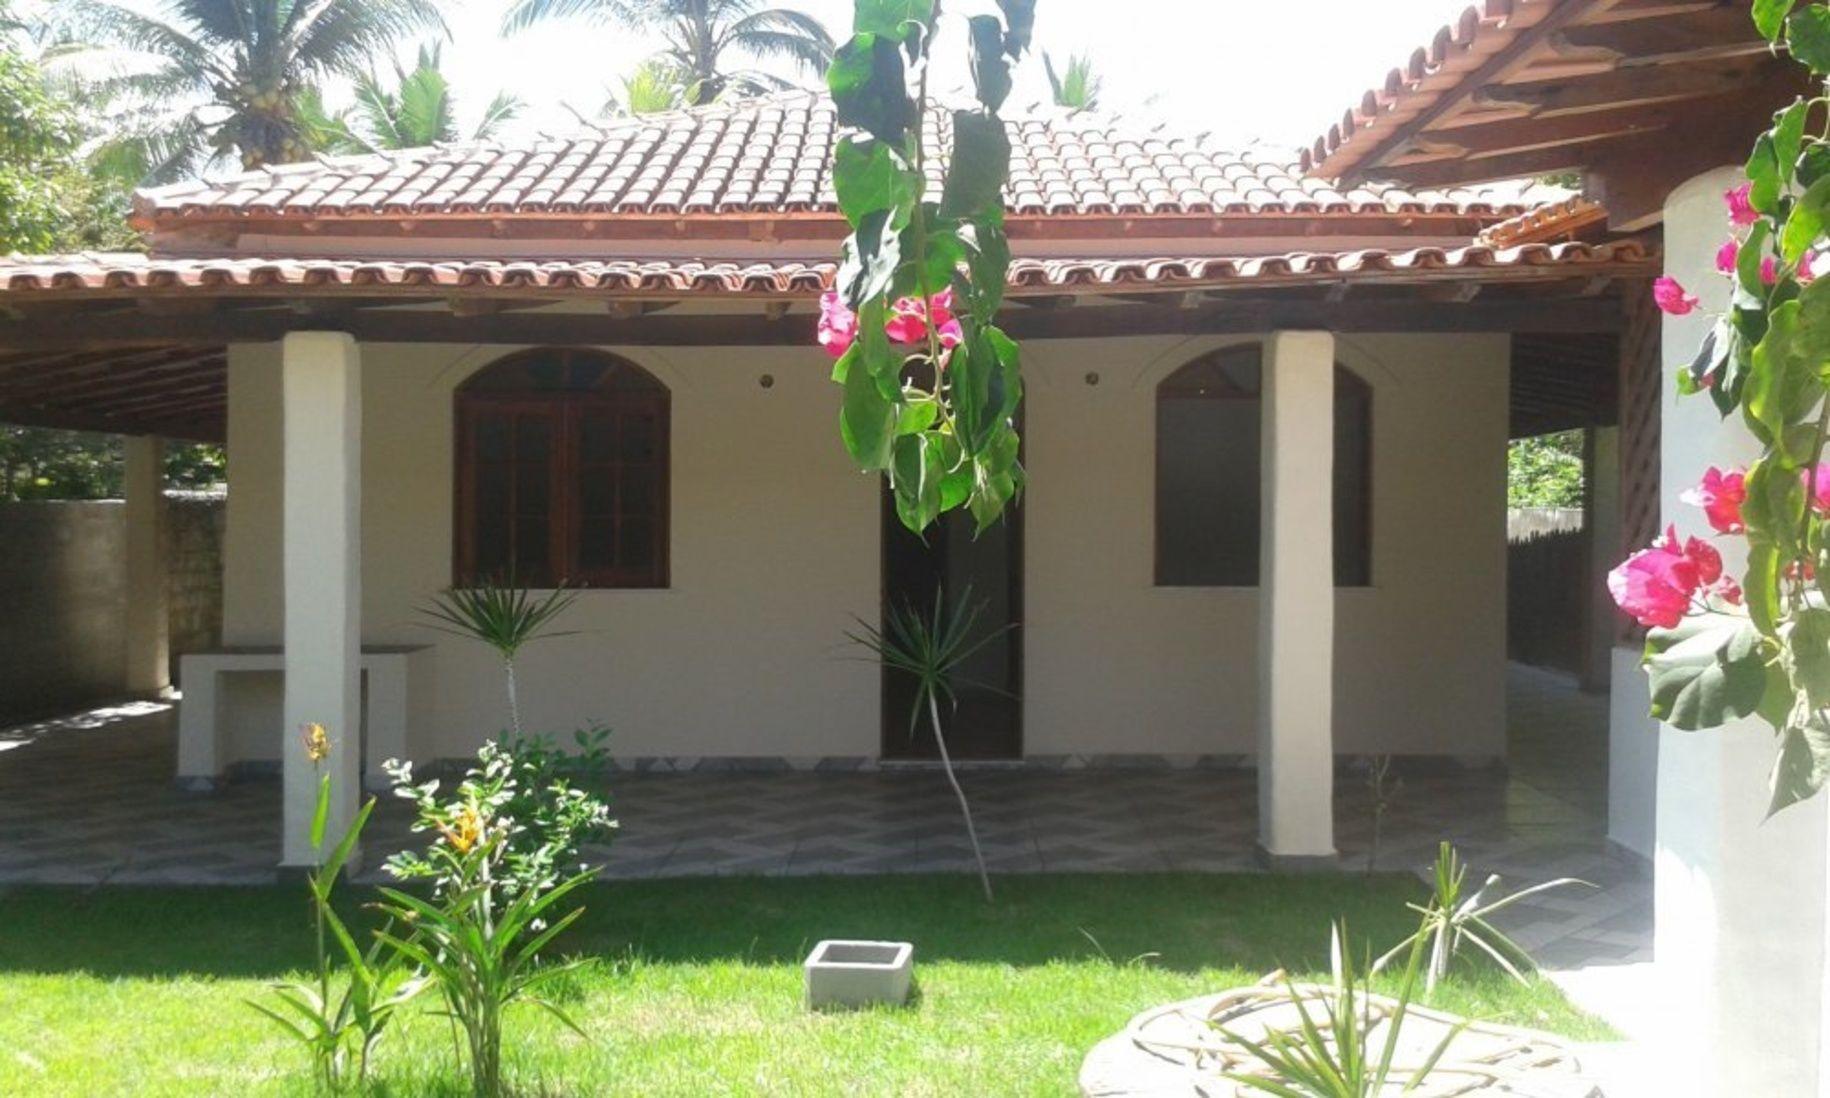 Brasilien Bahia Immobilie In Canavieiras Haus Am Meer Zu Verkaufen Kaufpreis 15 Reduziert Auf 89 000 Euro Brasilien B Outdoor Structures Pergola Outdoor